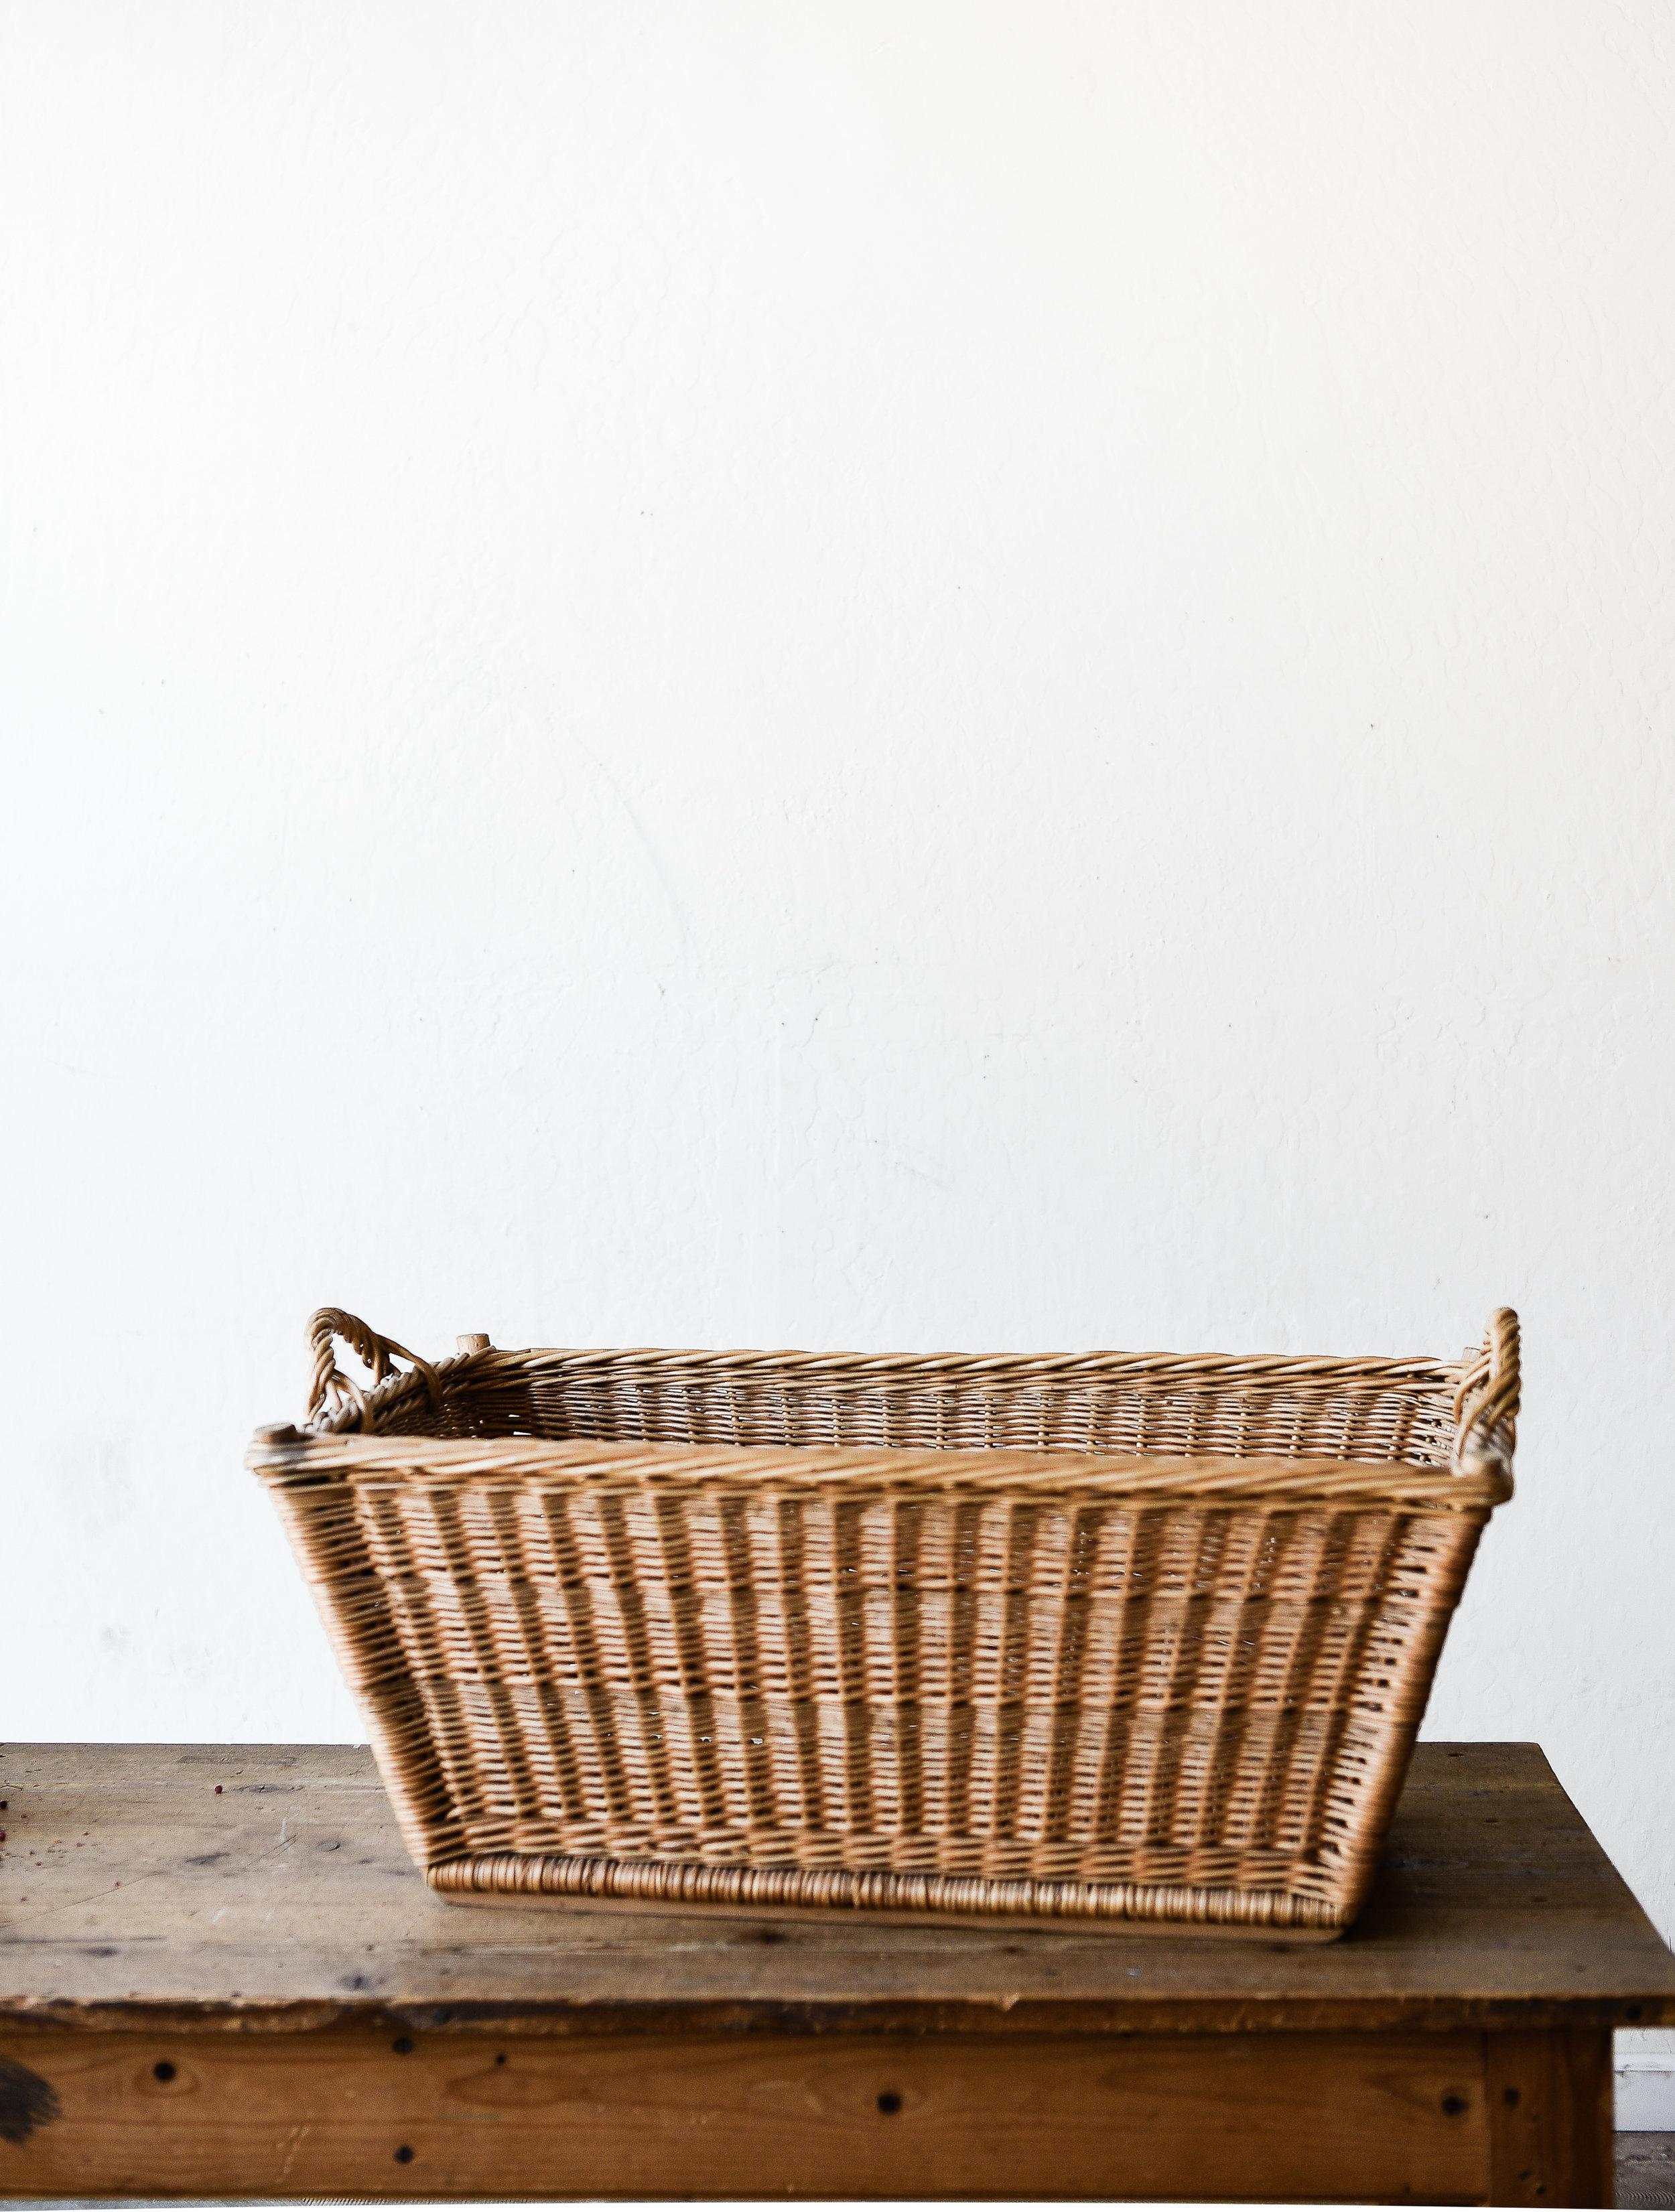 Vintage laundry basket farmhouse decor from boxwoodavenue.com